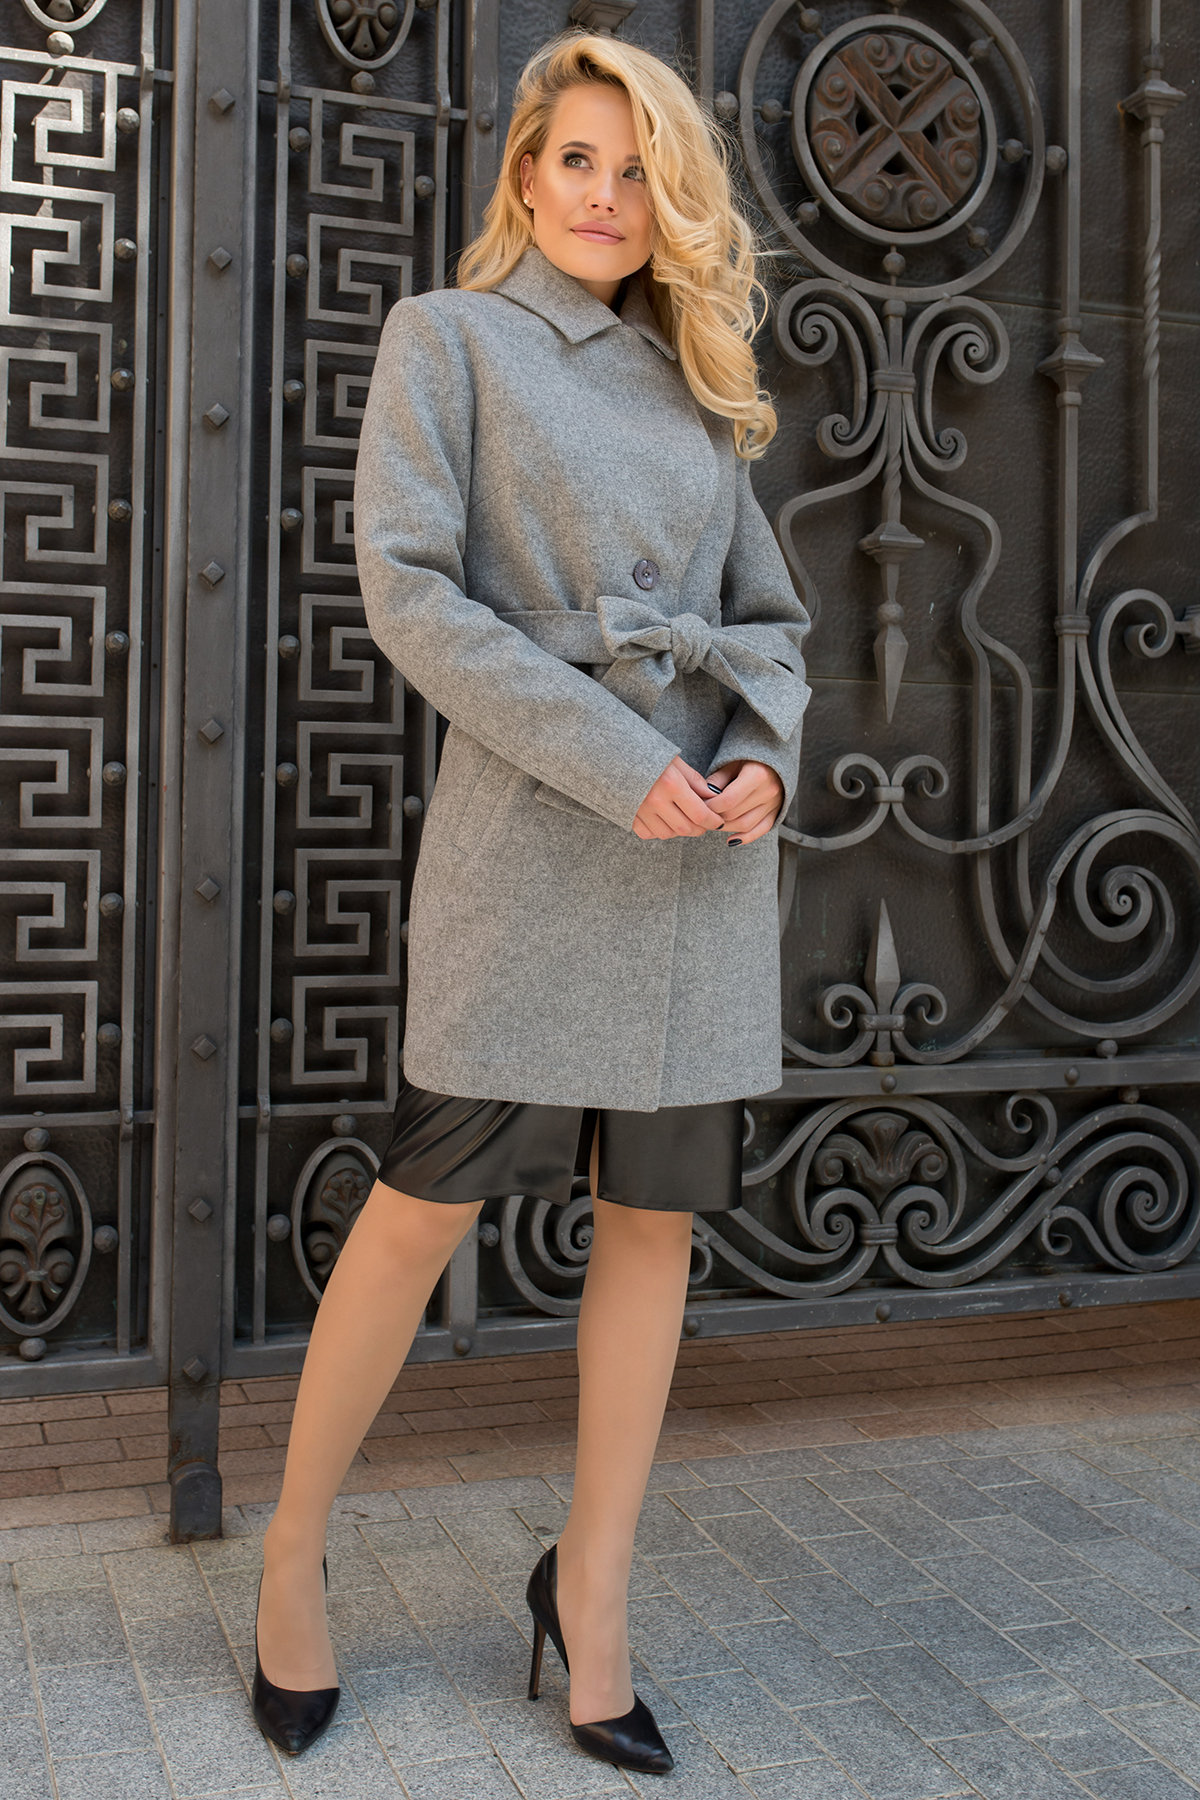 Пальто Габриэлла 7823 АРТ. 43703 Цвет: Серый 1 - фото 3, интернет магазин tm-modus.ru